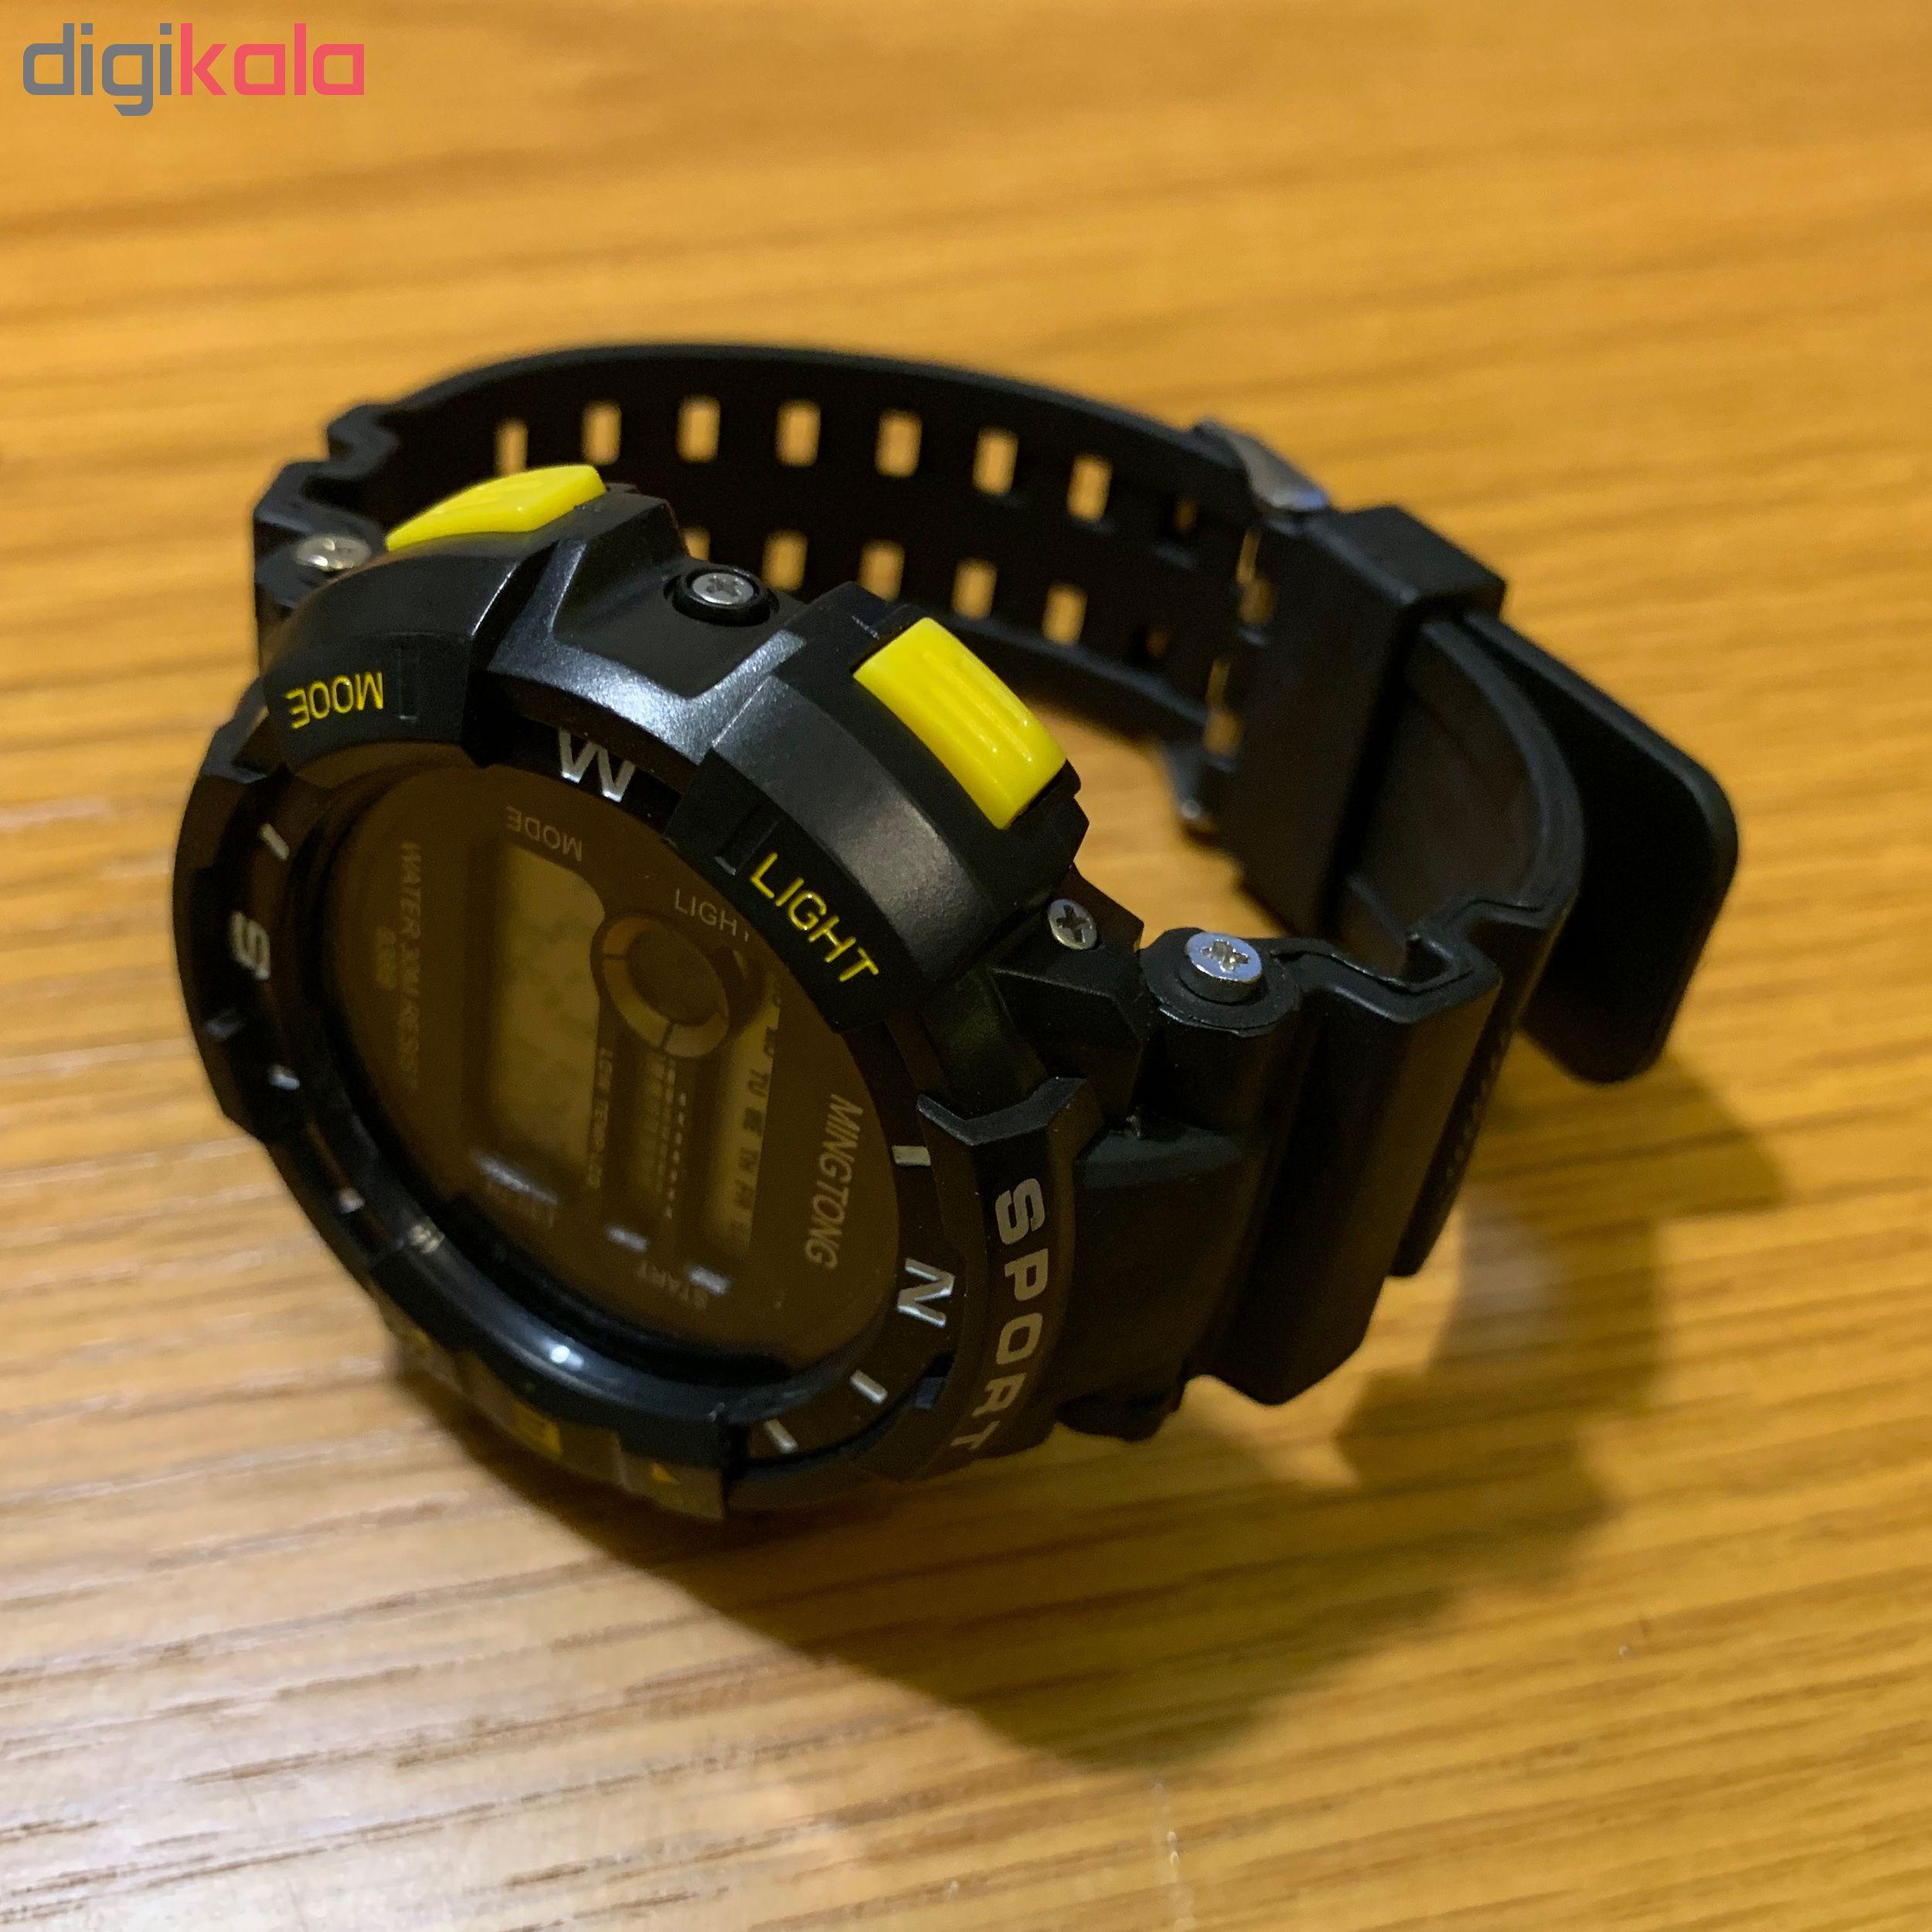 ساعت مچی دیجیتال مردانه مینگ تانگ کد B16             قیمت